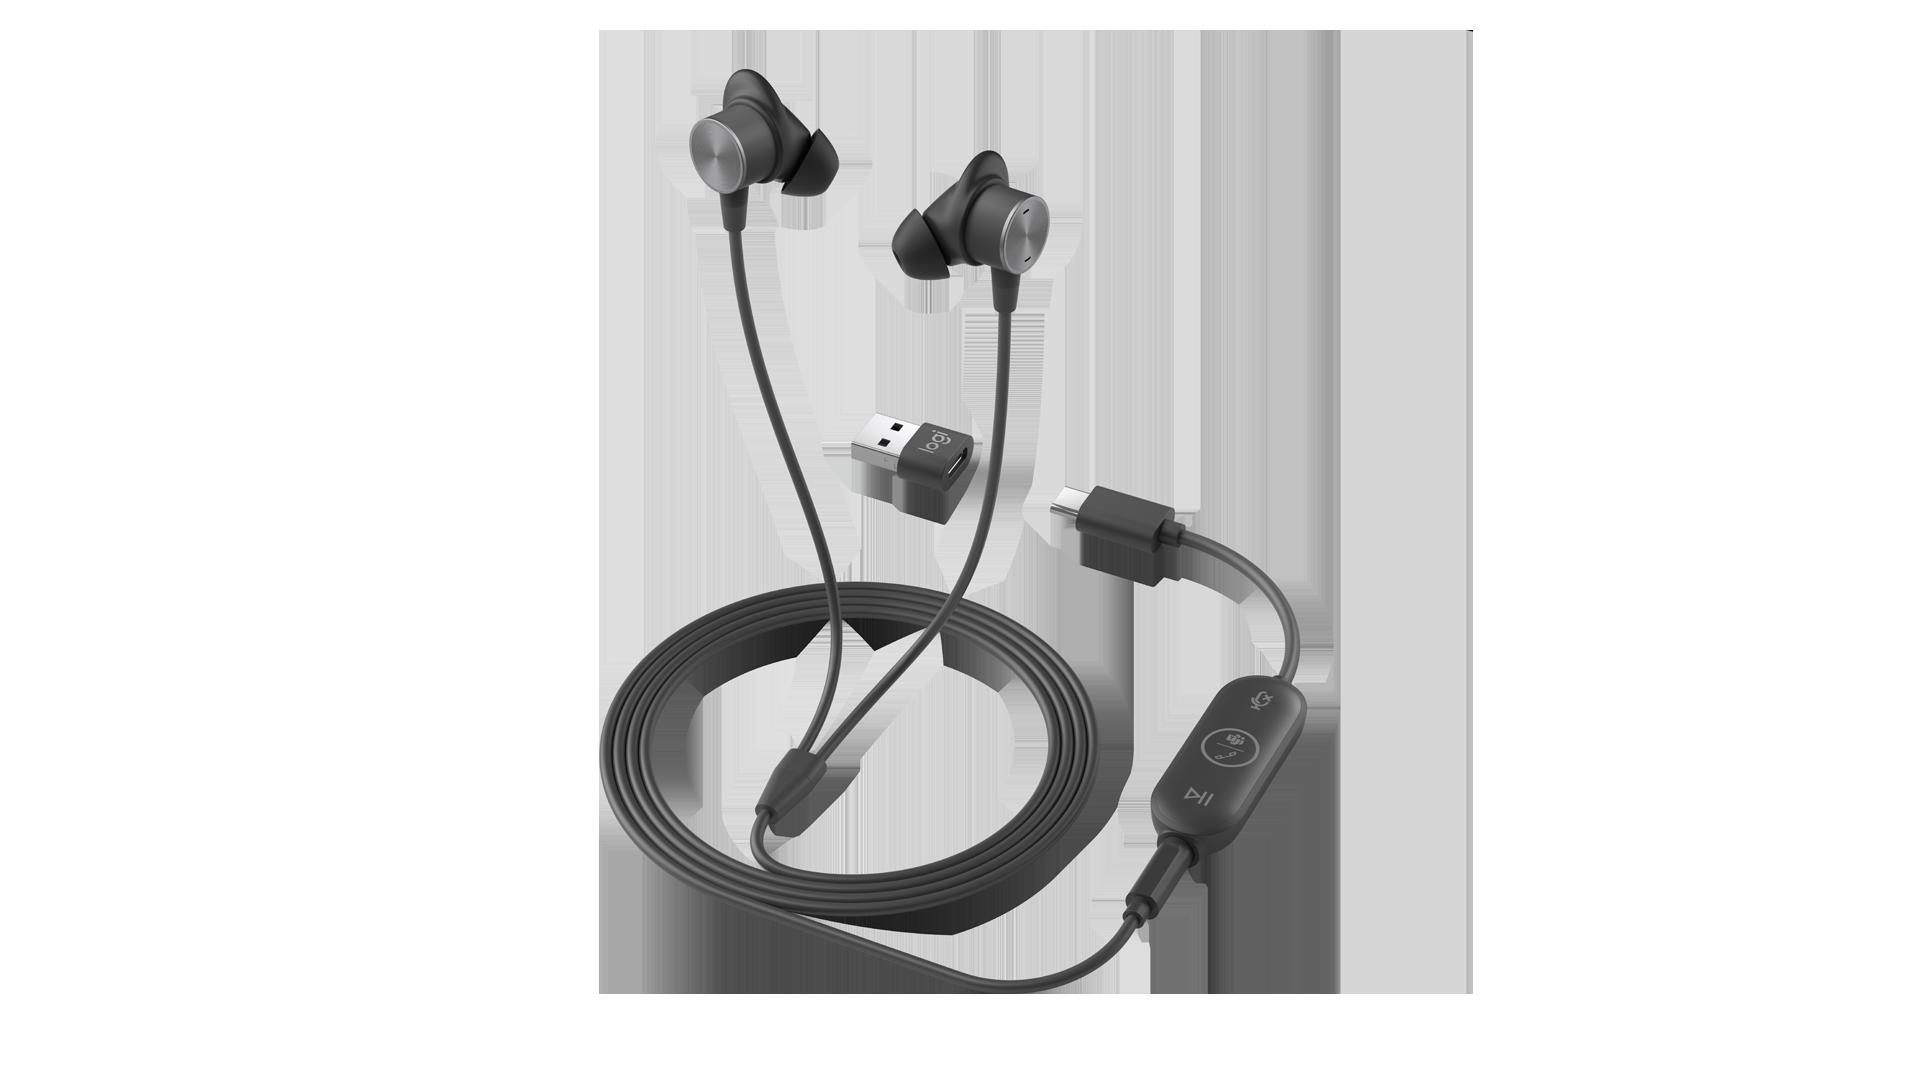 Logitech - Zone Wired Earbuds